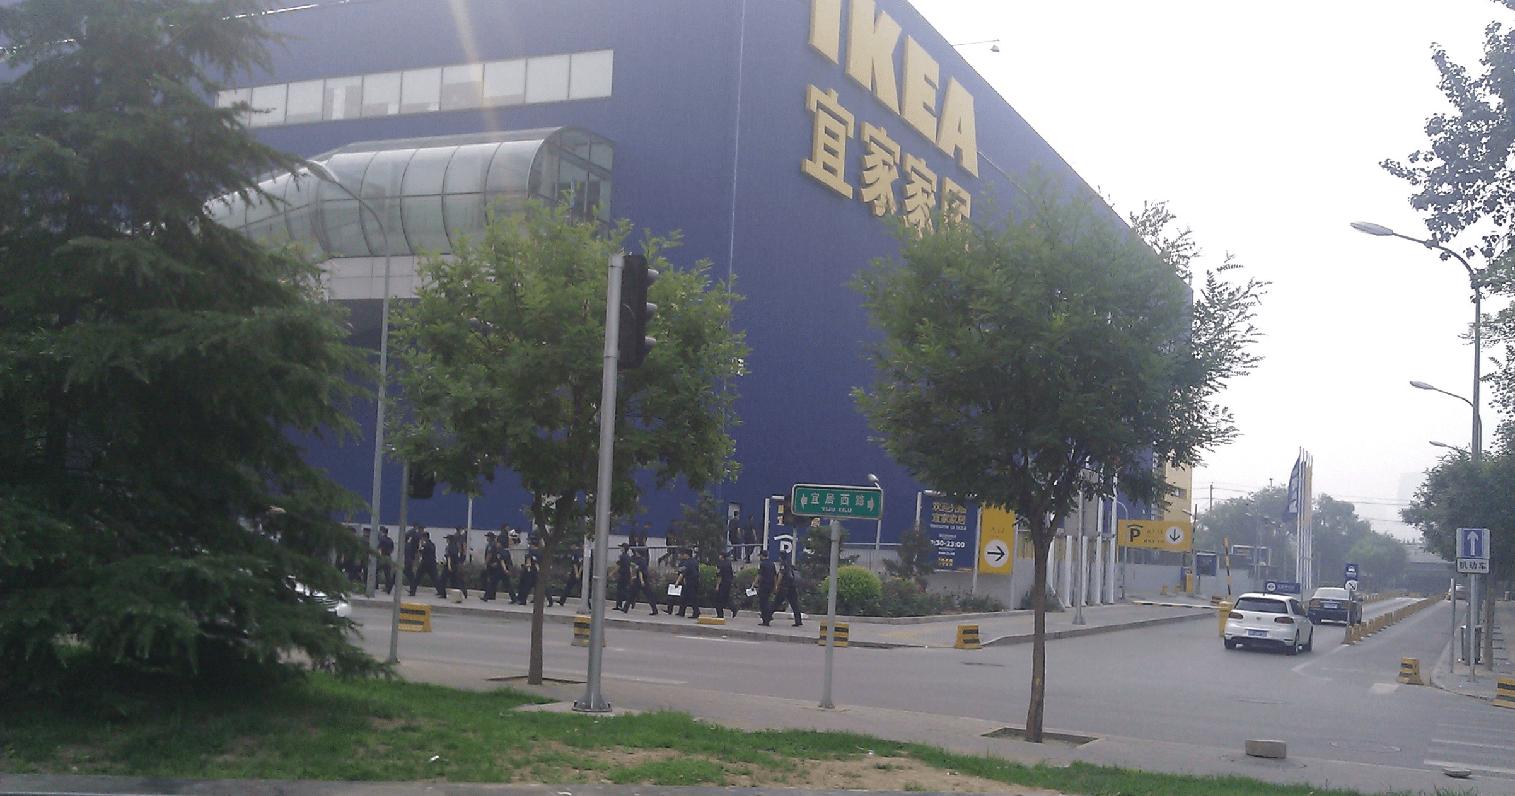 IKEA Beijing guards conducting security training